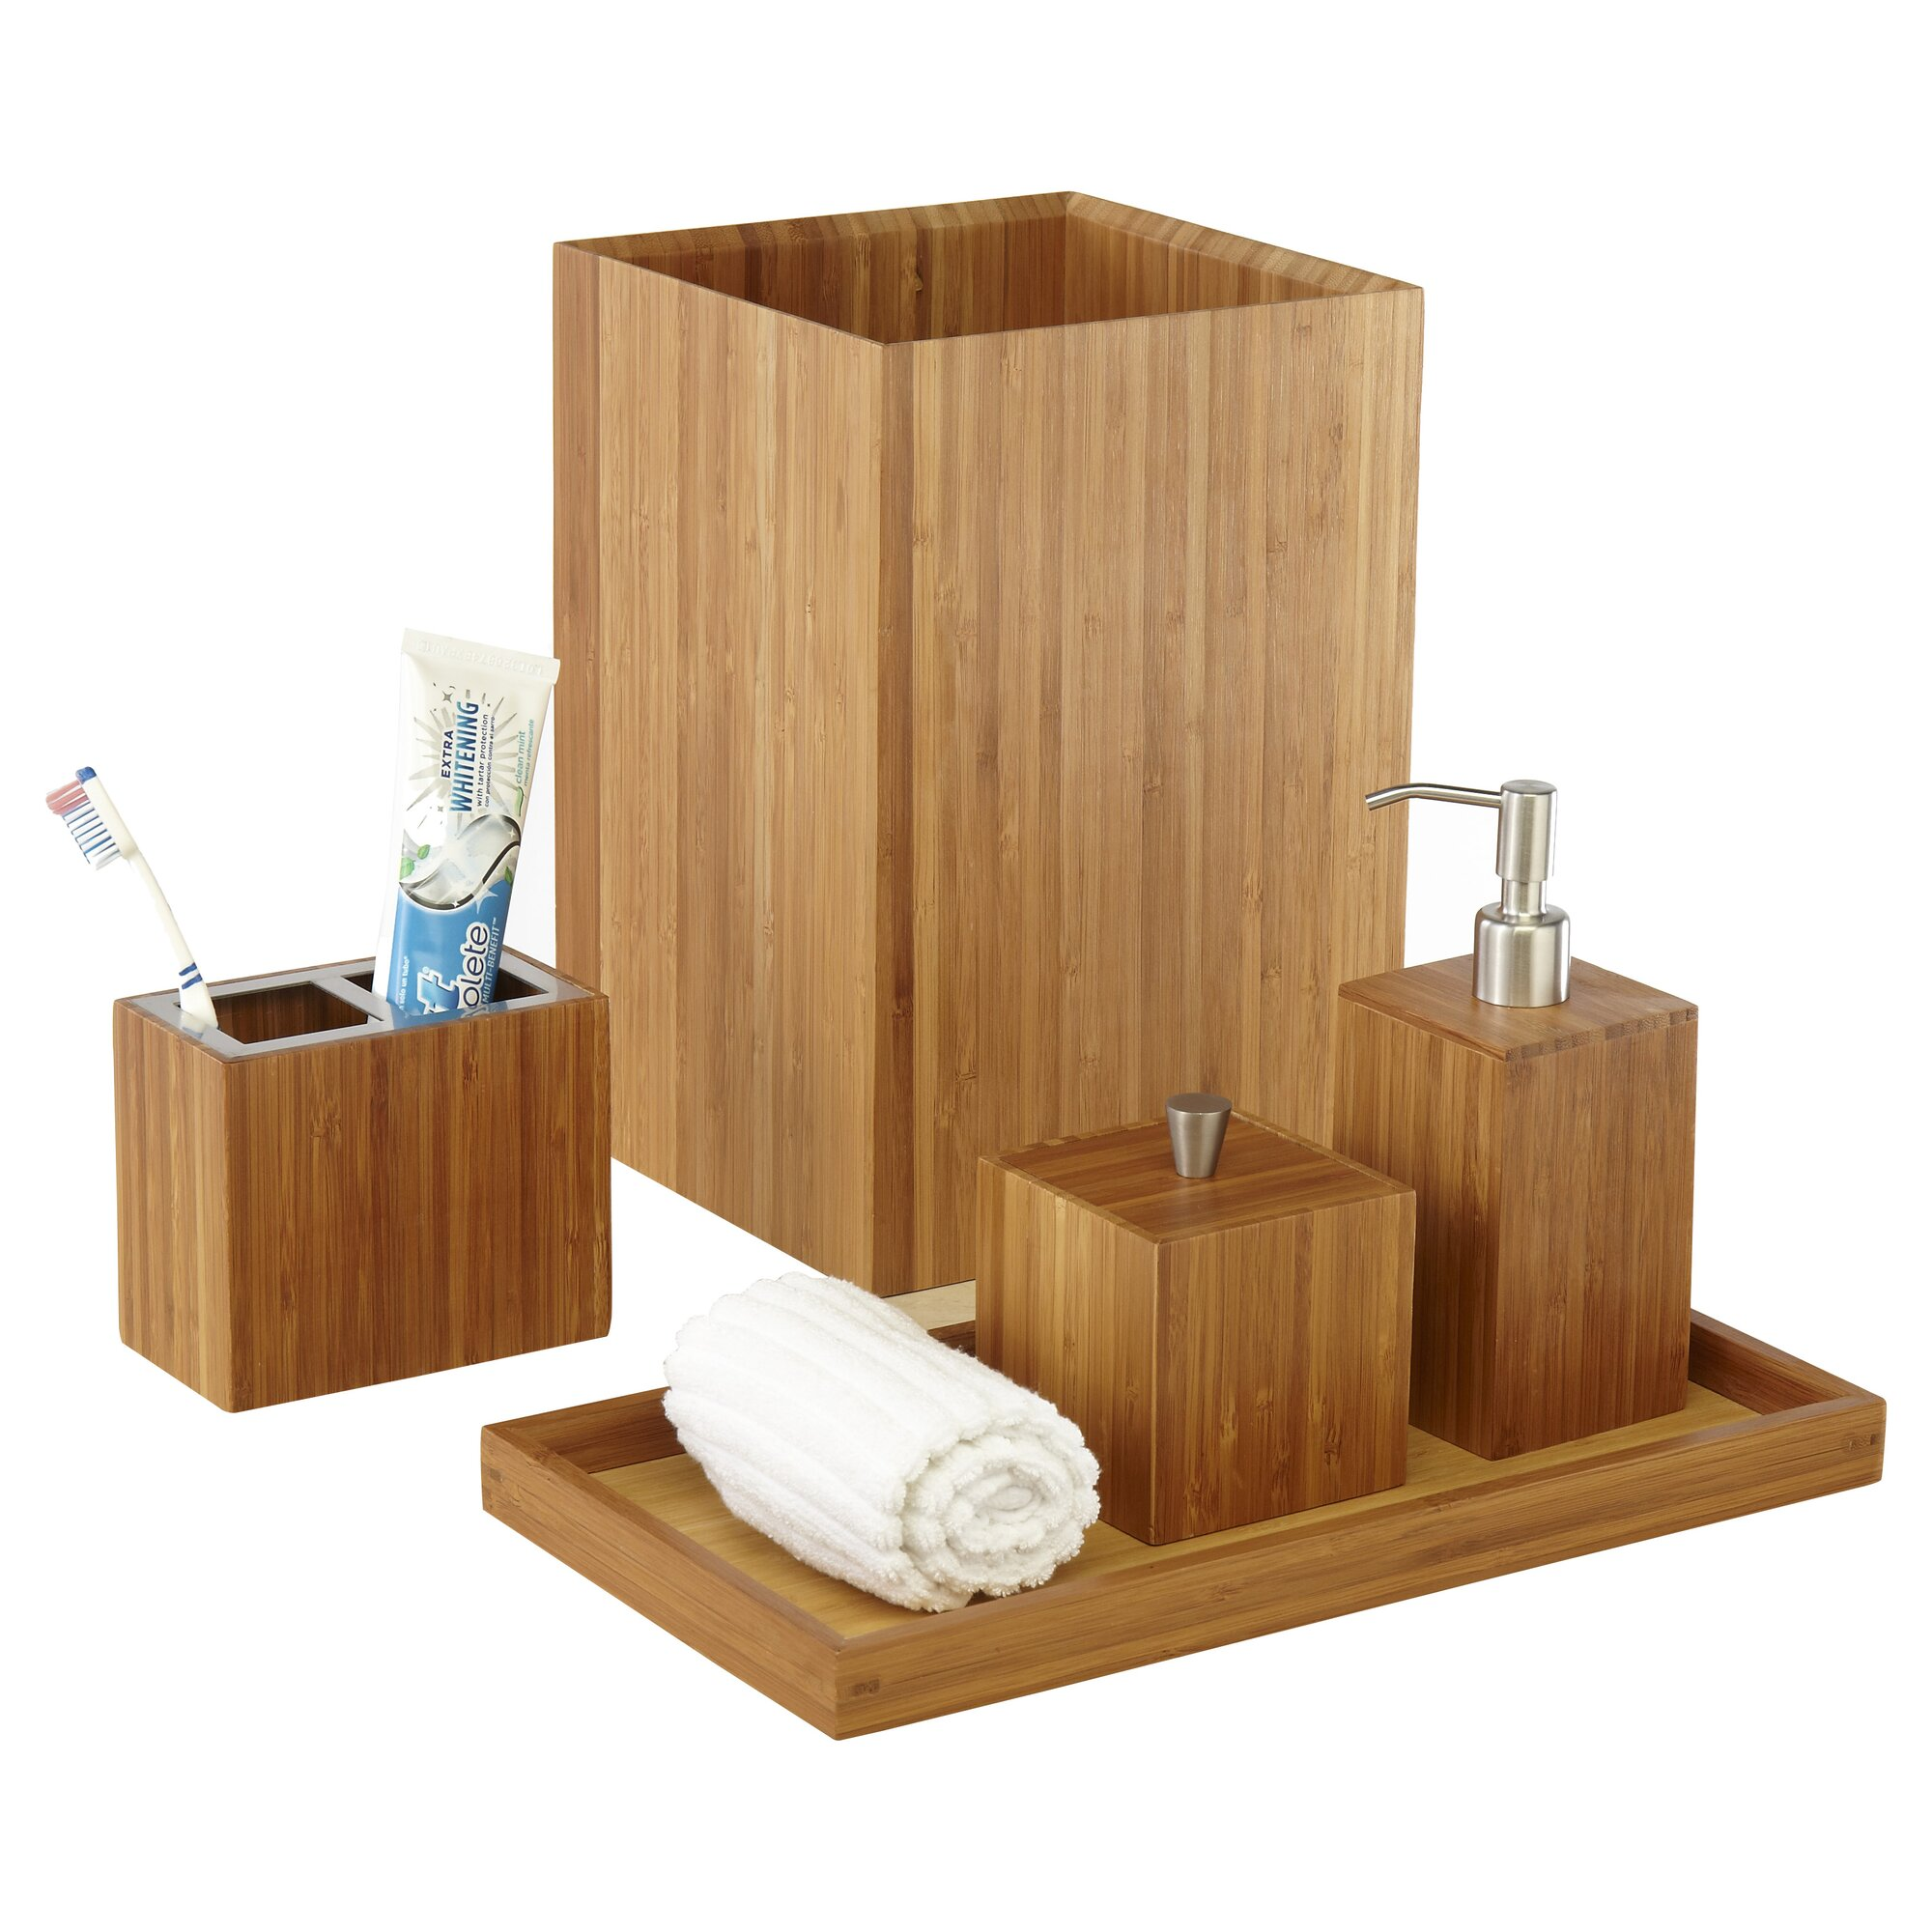 Luxury bathroom accessories sets - Luxury Bathroom Accessories Sets 33